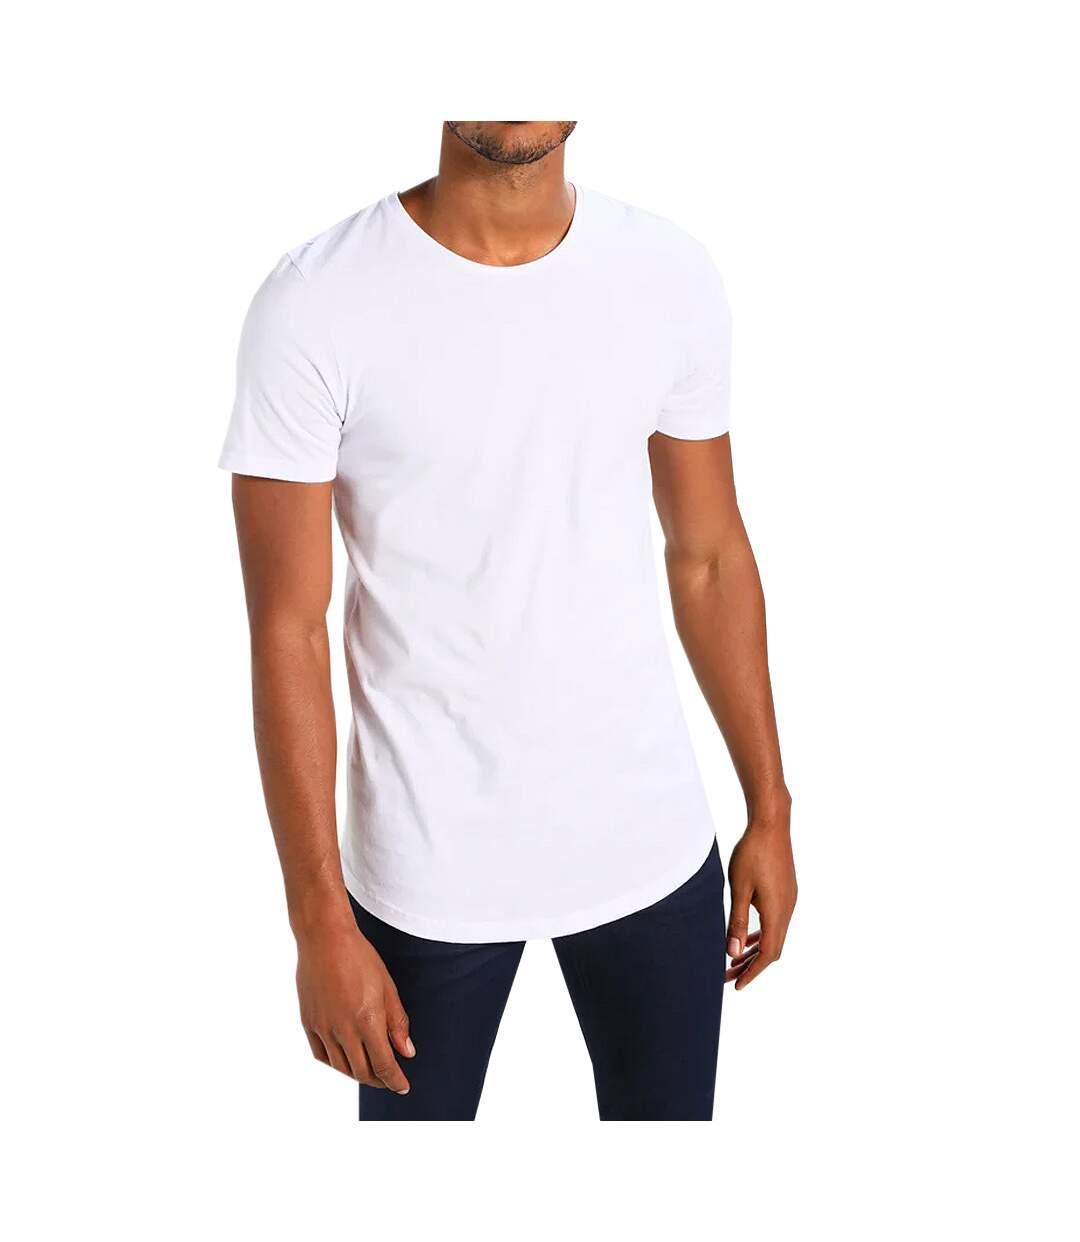 T-shirt Blanc Homme Jack & Jones CREW NECK